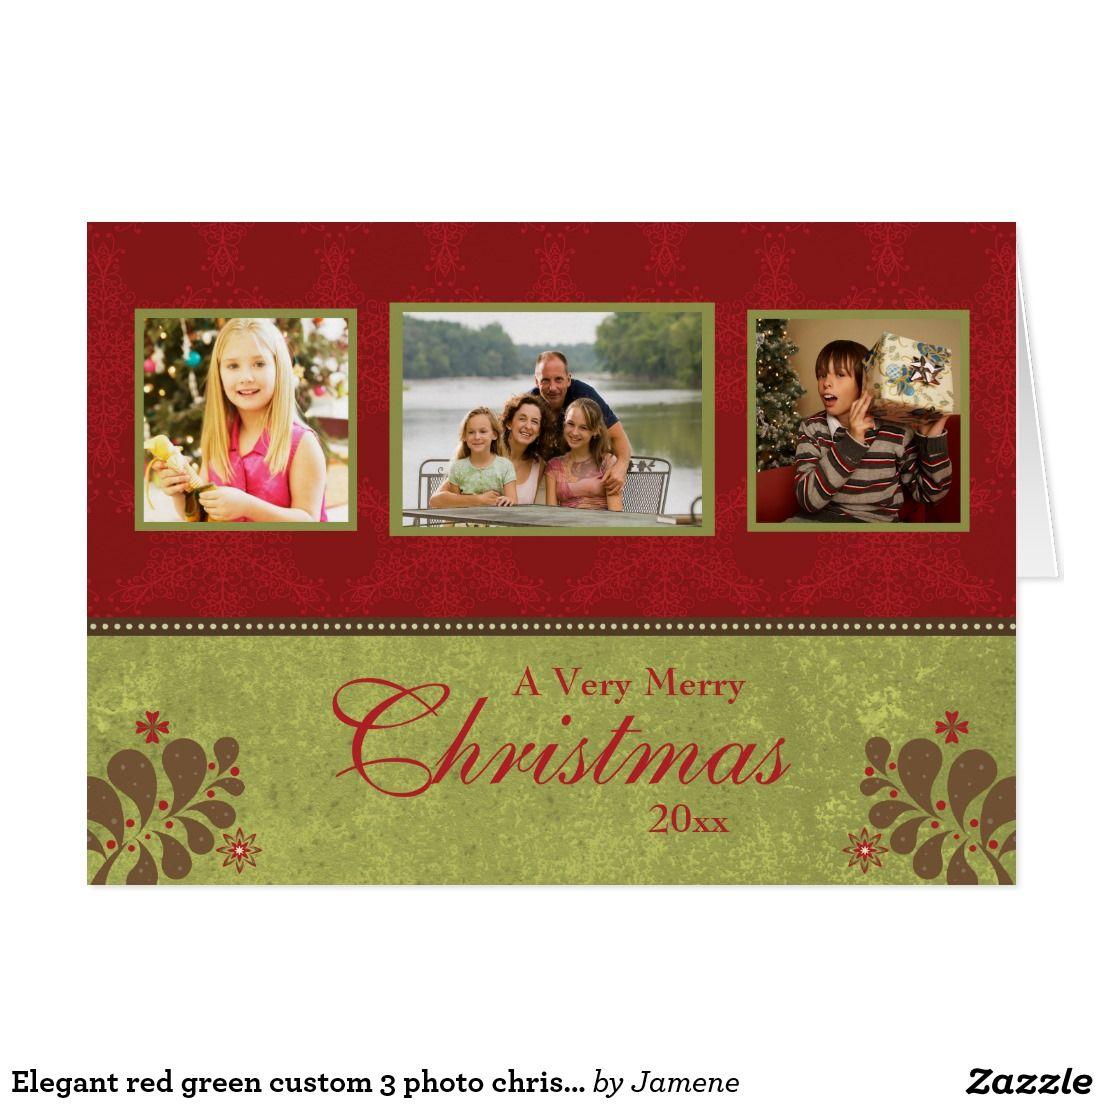 Elegant red green custom 3 photo christmas card | Custom PHOTO ...